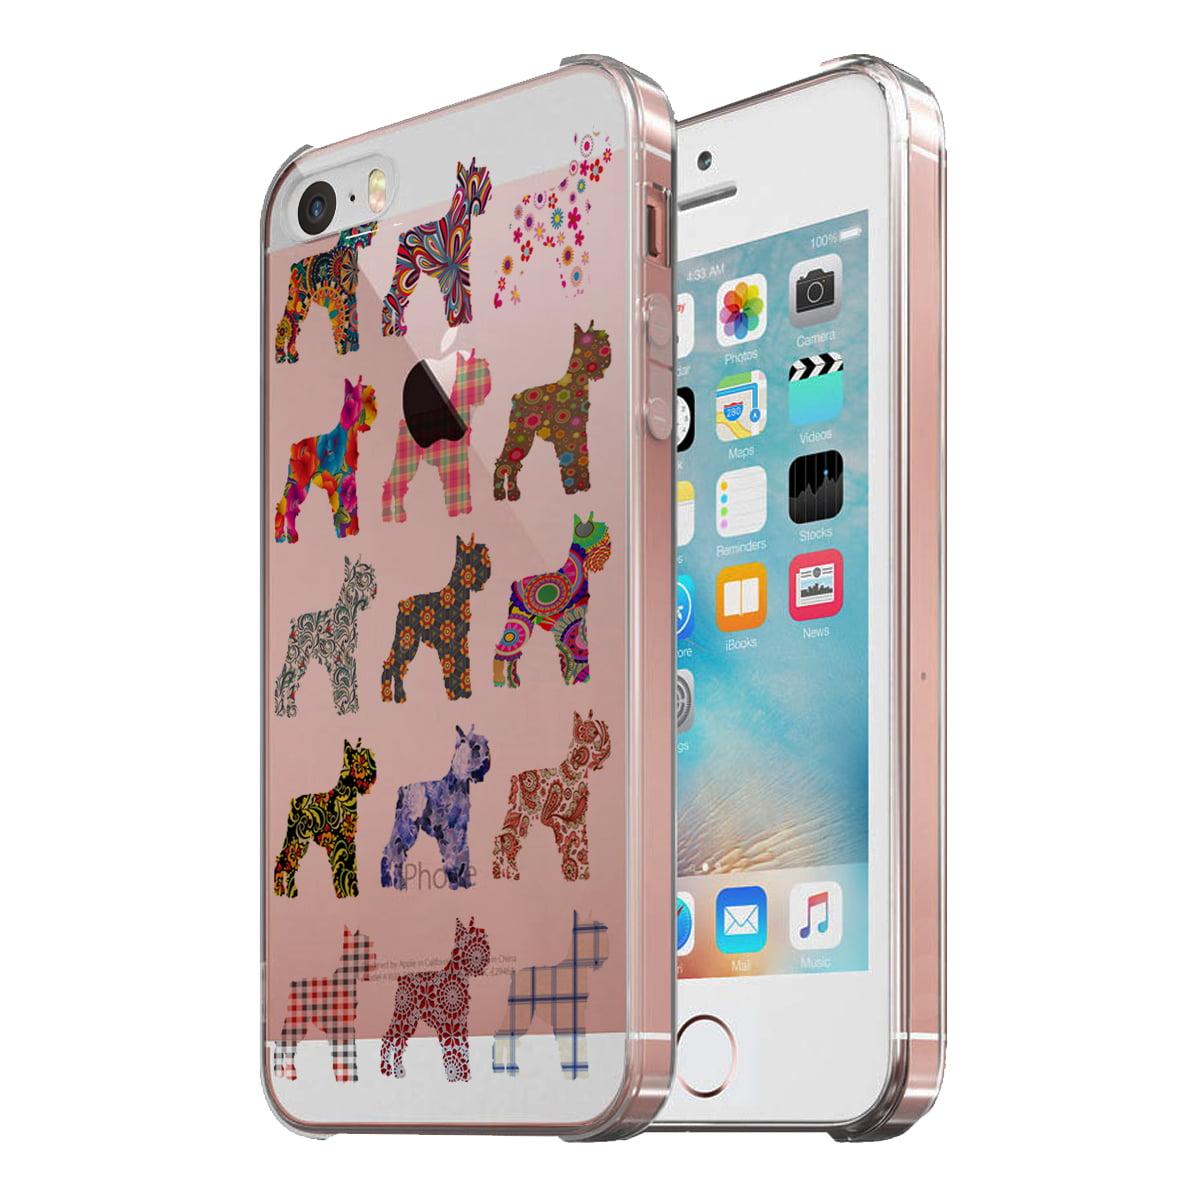 KuzmarK Clear Cover Case fits iPhone SE & iPhone 5 - Schnauzer Dog